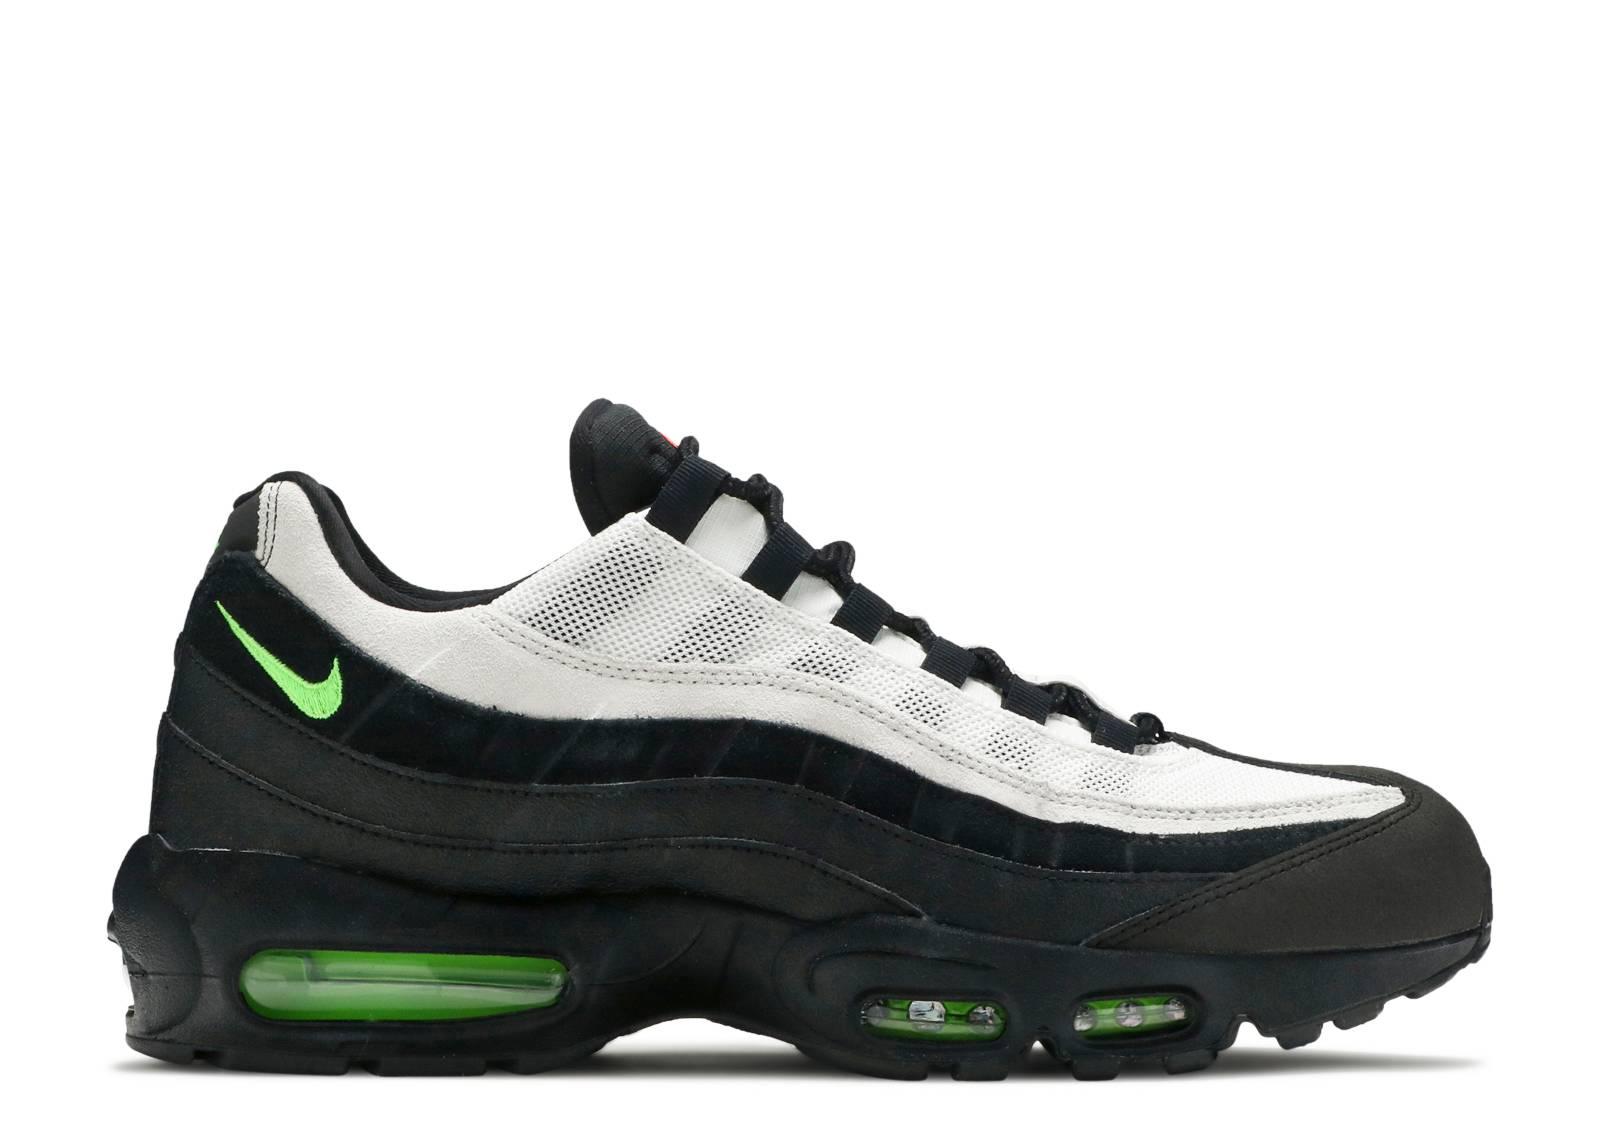 bala Armstrong pómulo  Nike Air Max 95 Sneakers | Flight Club